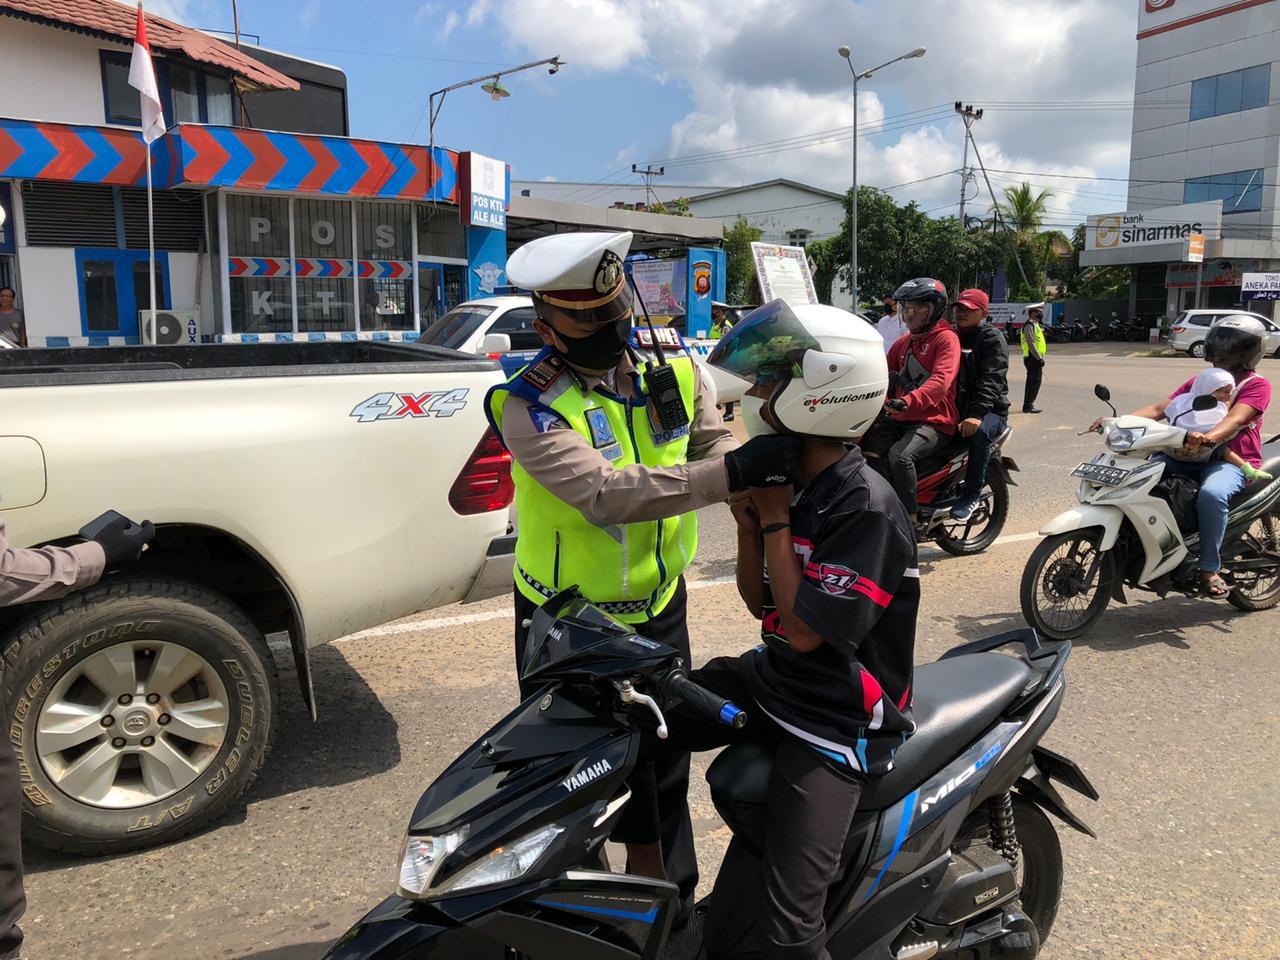 Ops Keselamatan Kapuas 2020 Polres Ketapang, Kasat Lantas Targetkan Peningkatan Kepatuhan Penggunaan